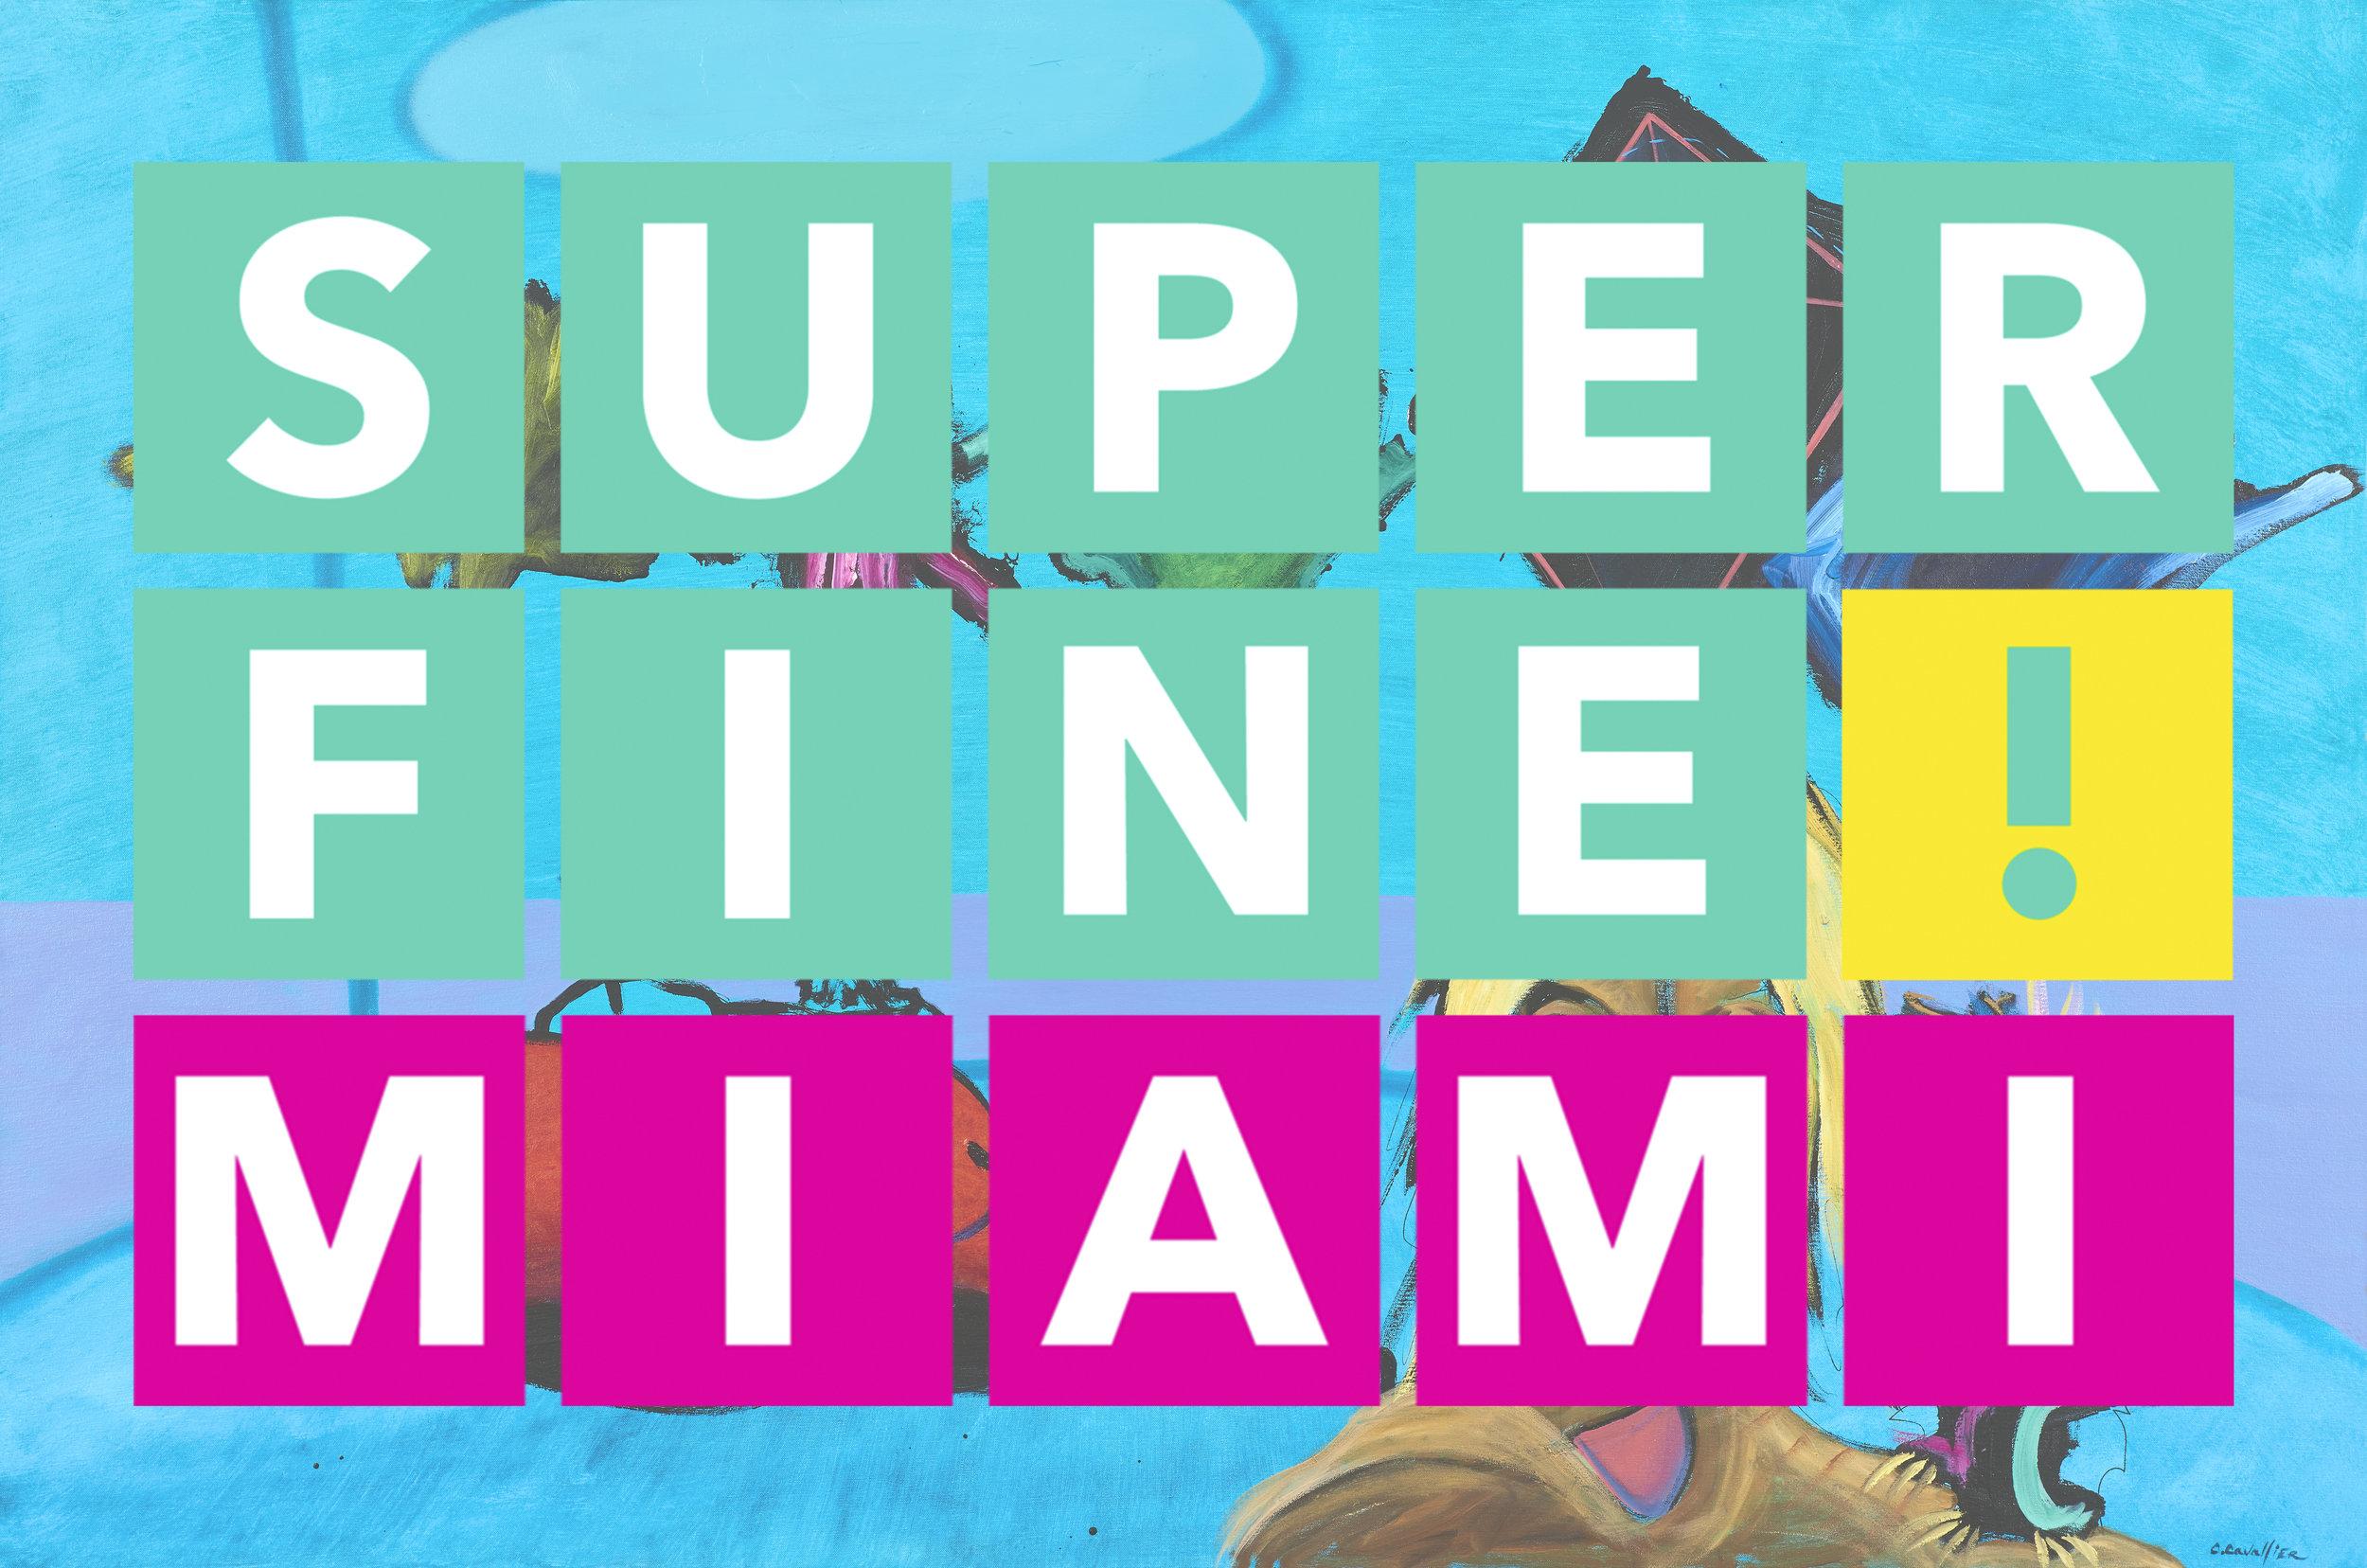 Image: Contemplation day on Titanus IV. 6' x 4'. Superfine! Miami logo.